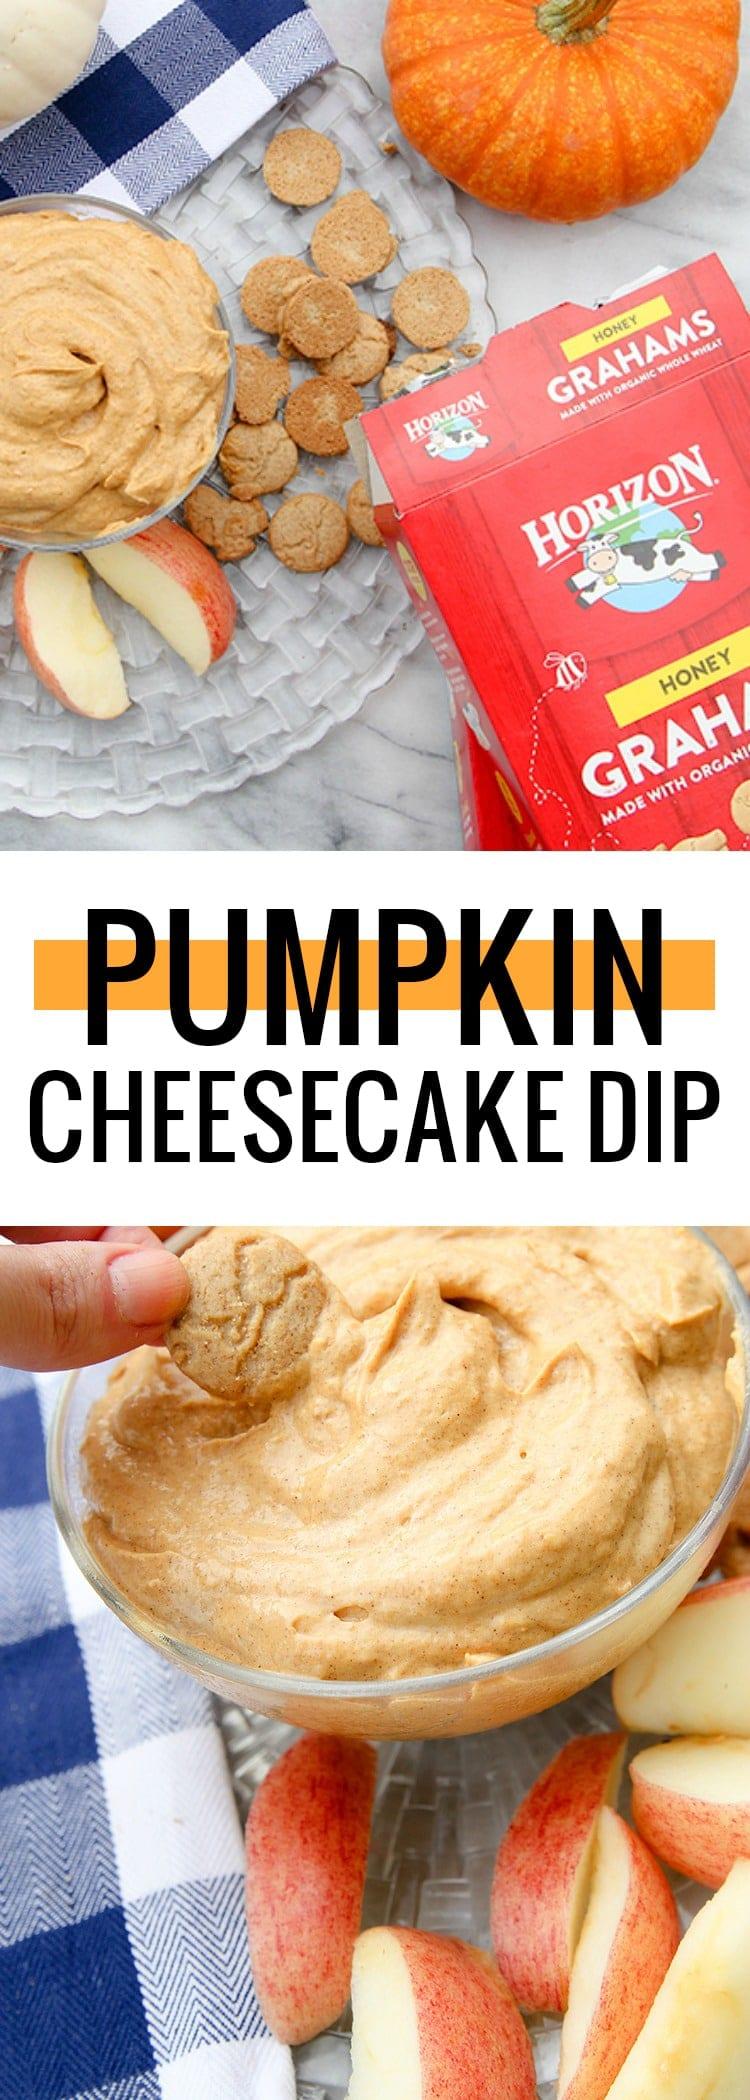 An easy, kid friendly pumpkin cheesecake dip that pairs perfectly with @HorizonOrganic Snack Grahams! #MoreHonestFood #HorizonTreats #HorizonSnacks #ad